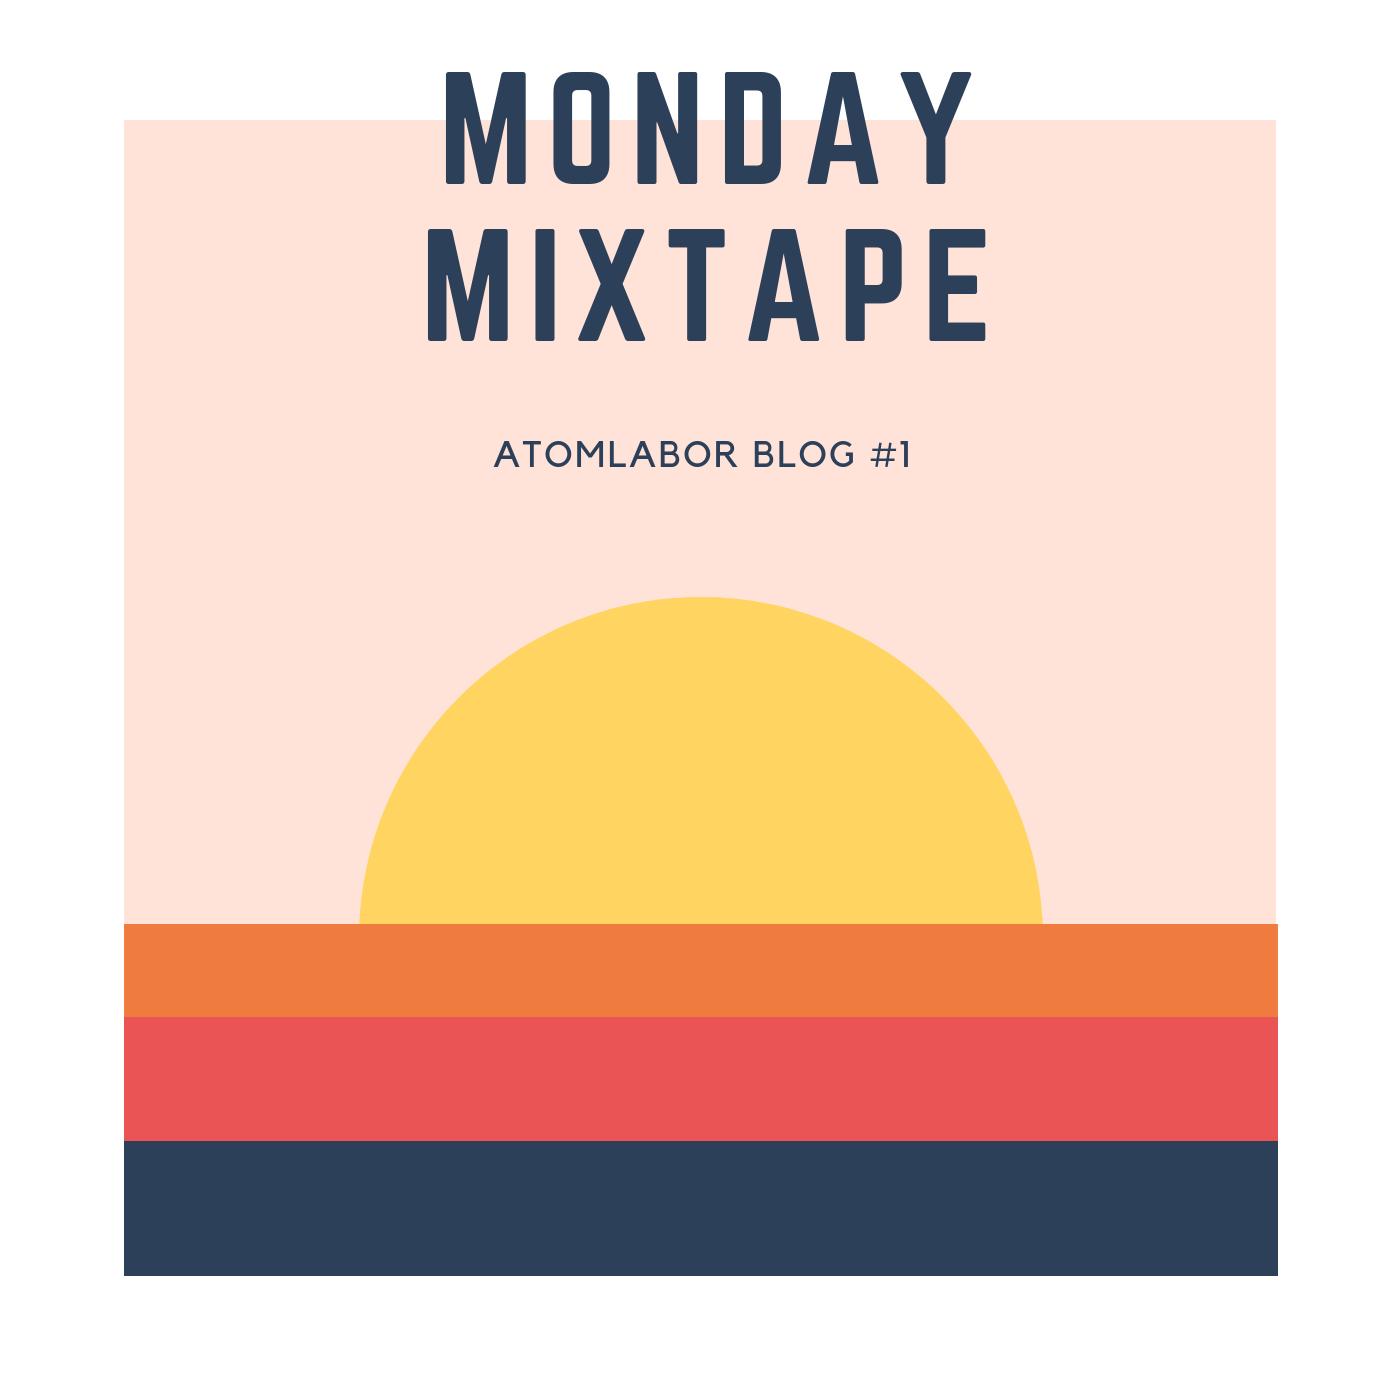 MONDAY MIXTAPE - ATOMLABOR #1 | GUTE LAUNE STREAM